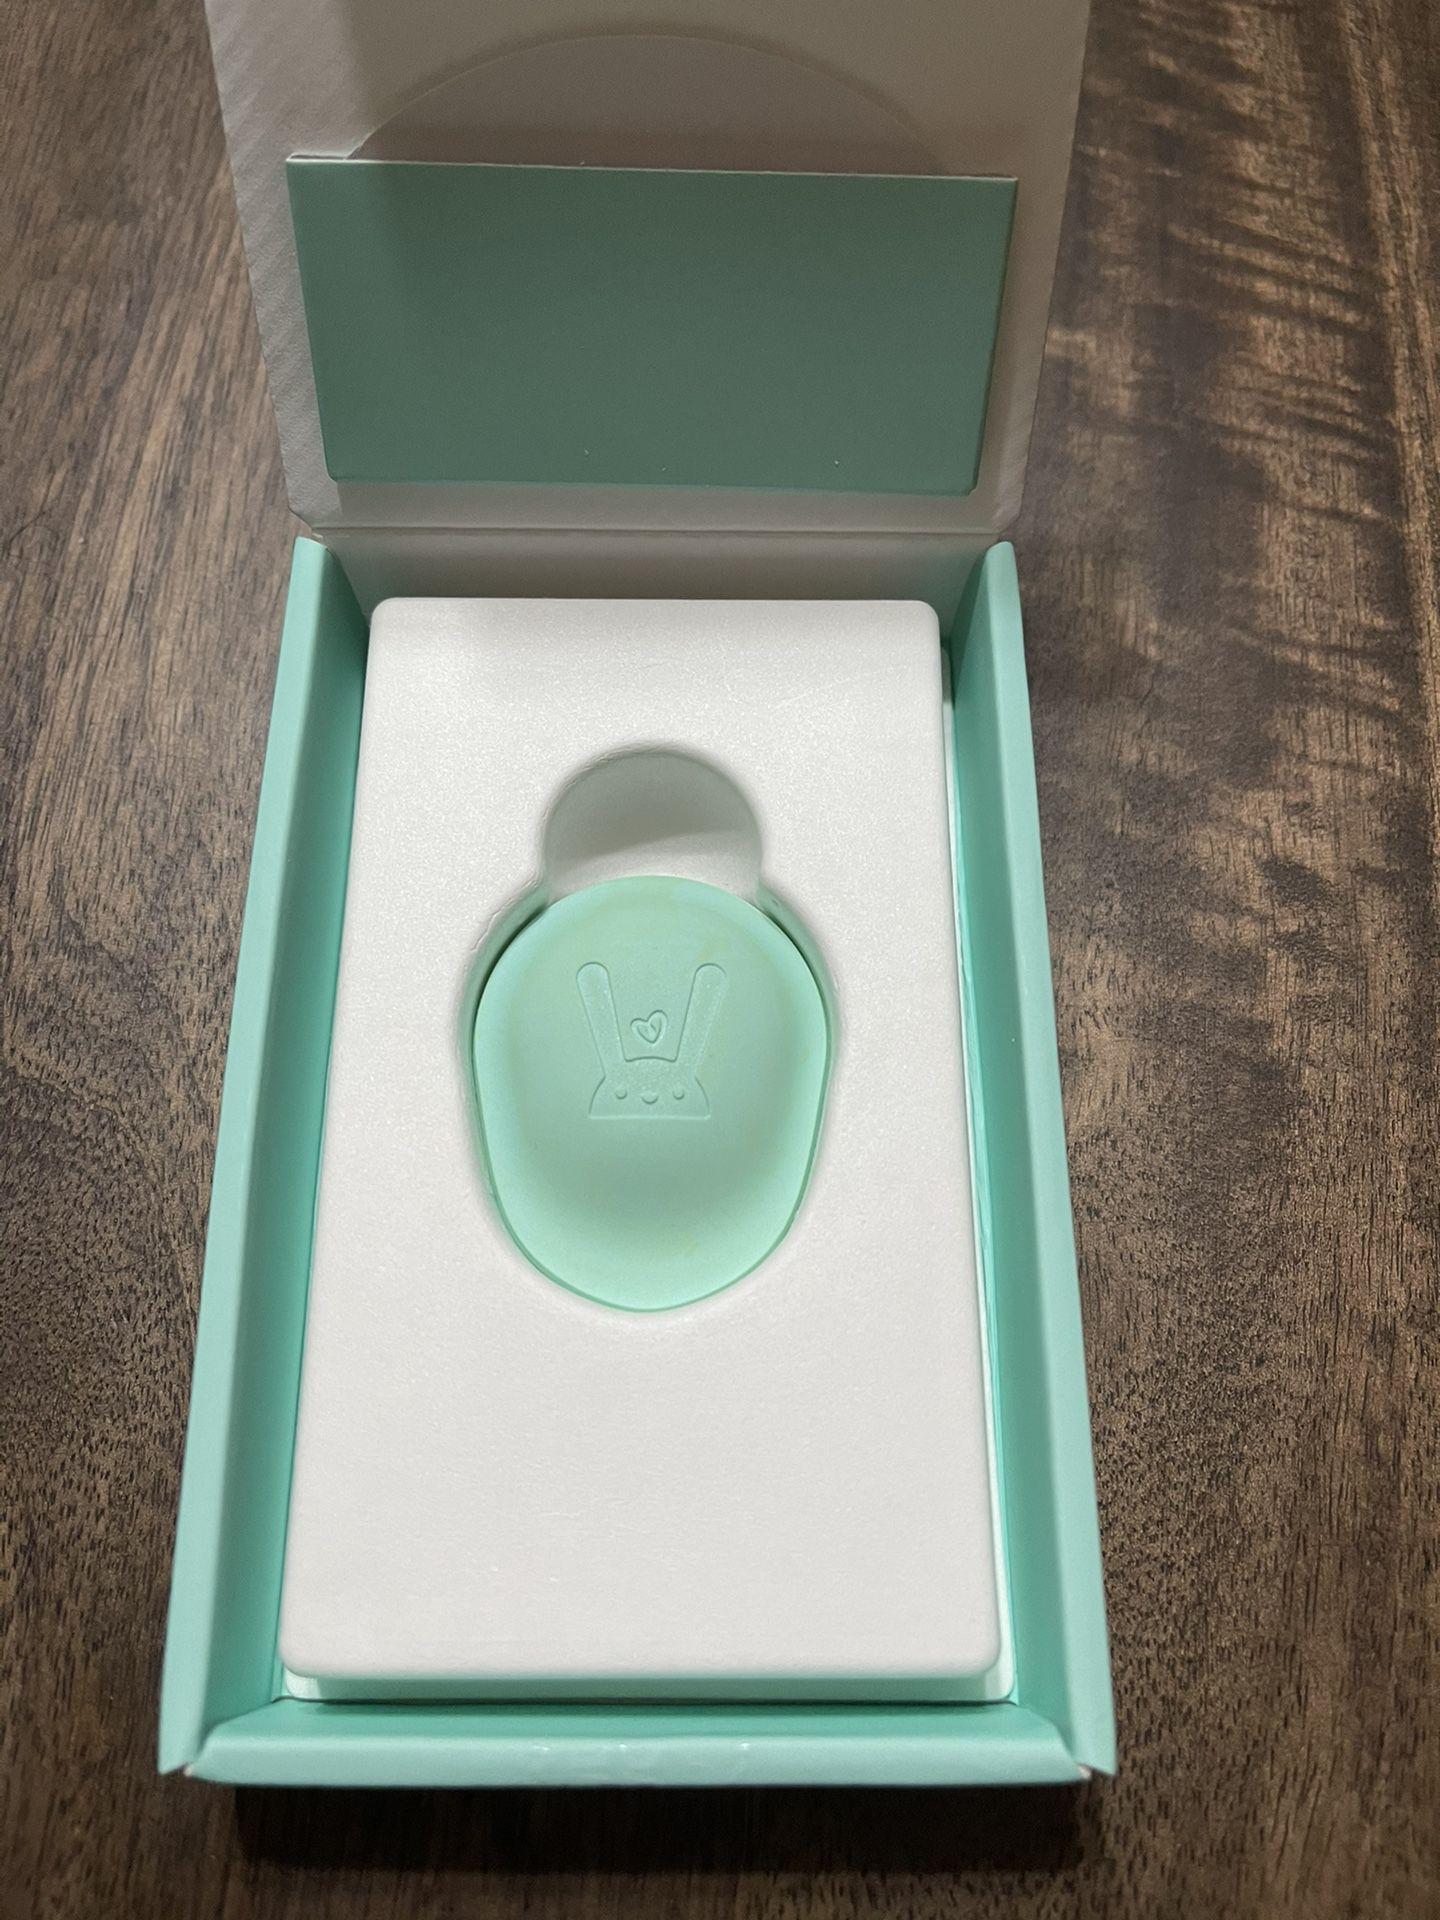 Lumi By Pampers Smart Video Baby Monitor + Sleep Kit Bundle